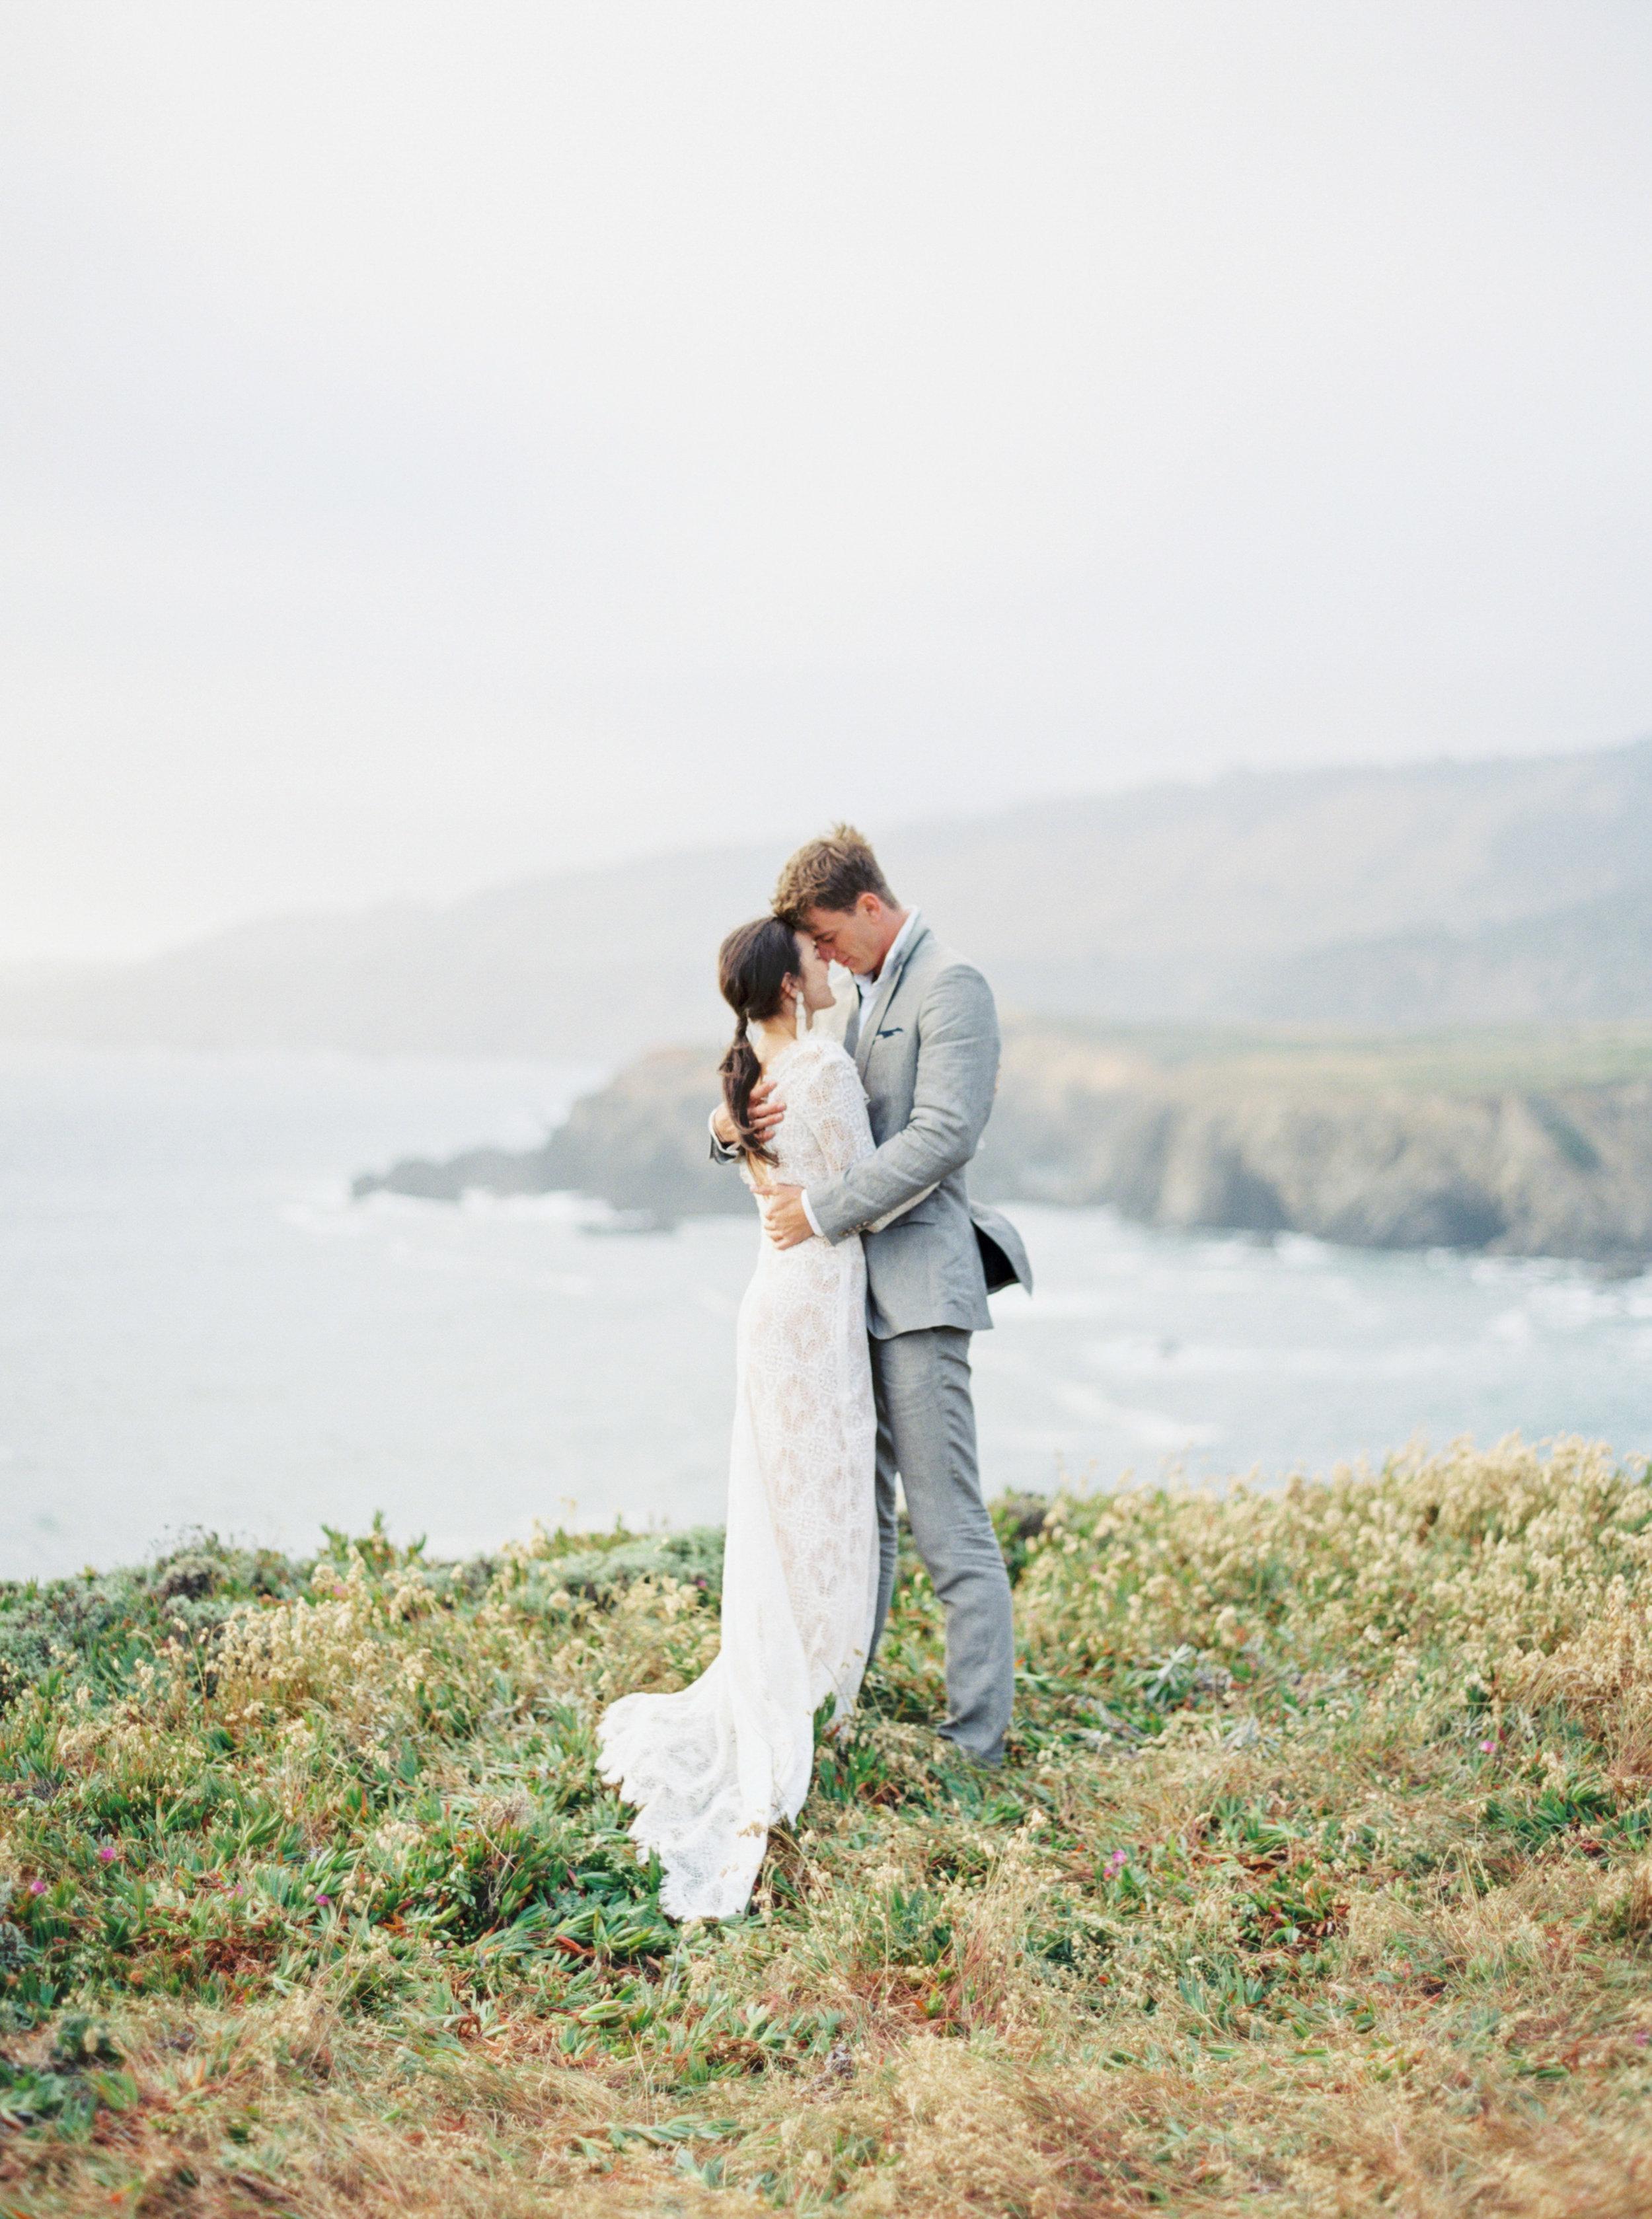 Lisa Catherine Photography - Joy Wed Listing_4.jpg